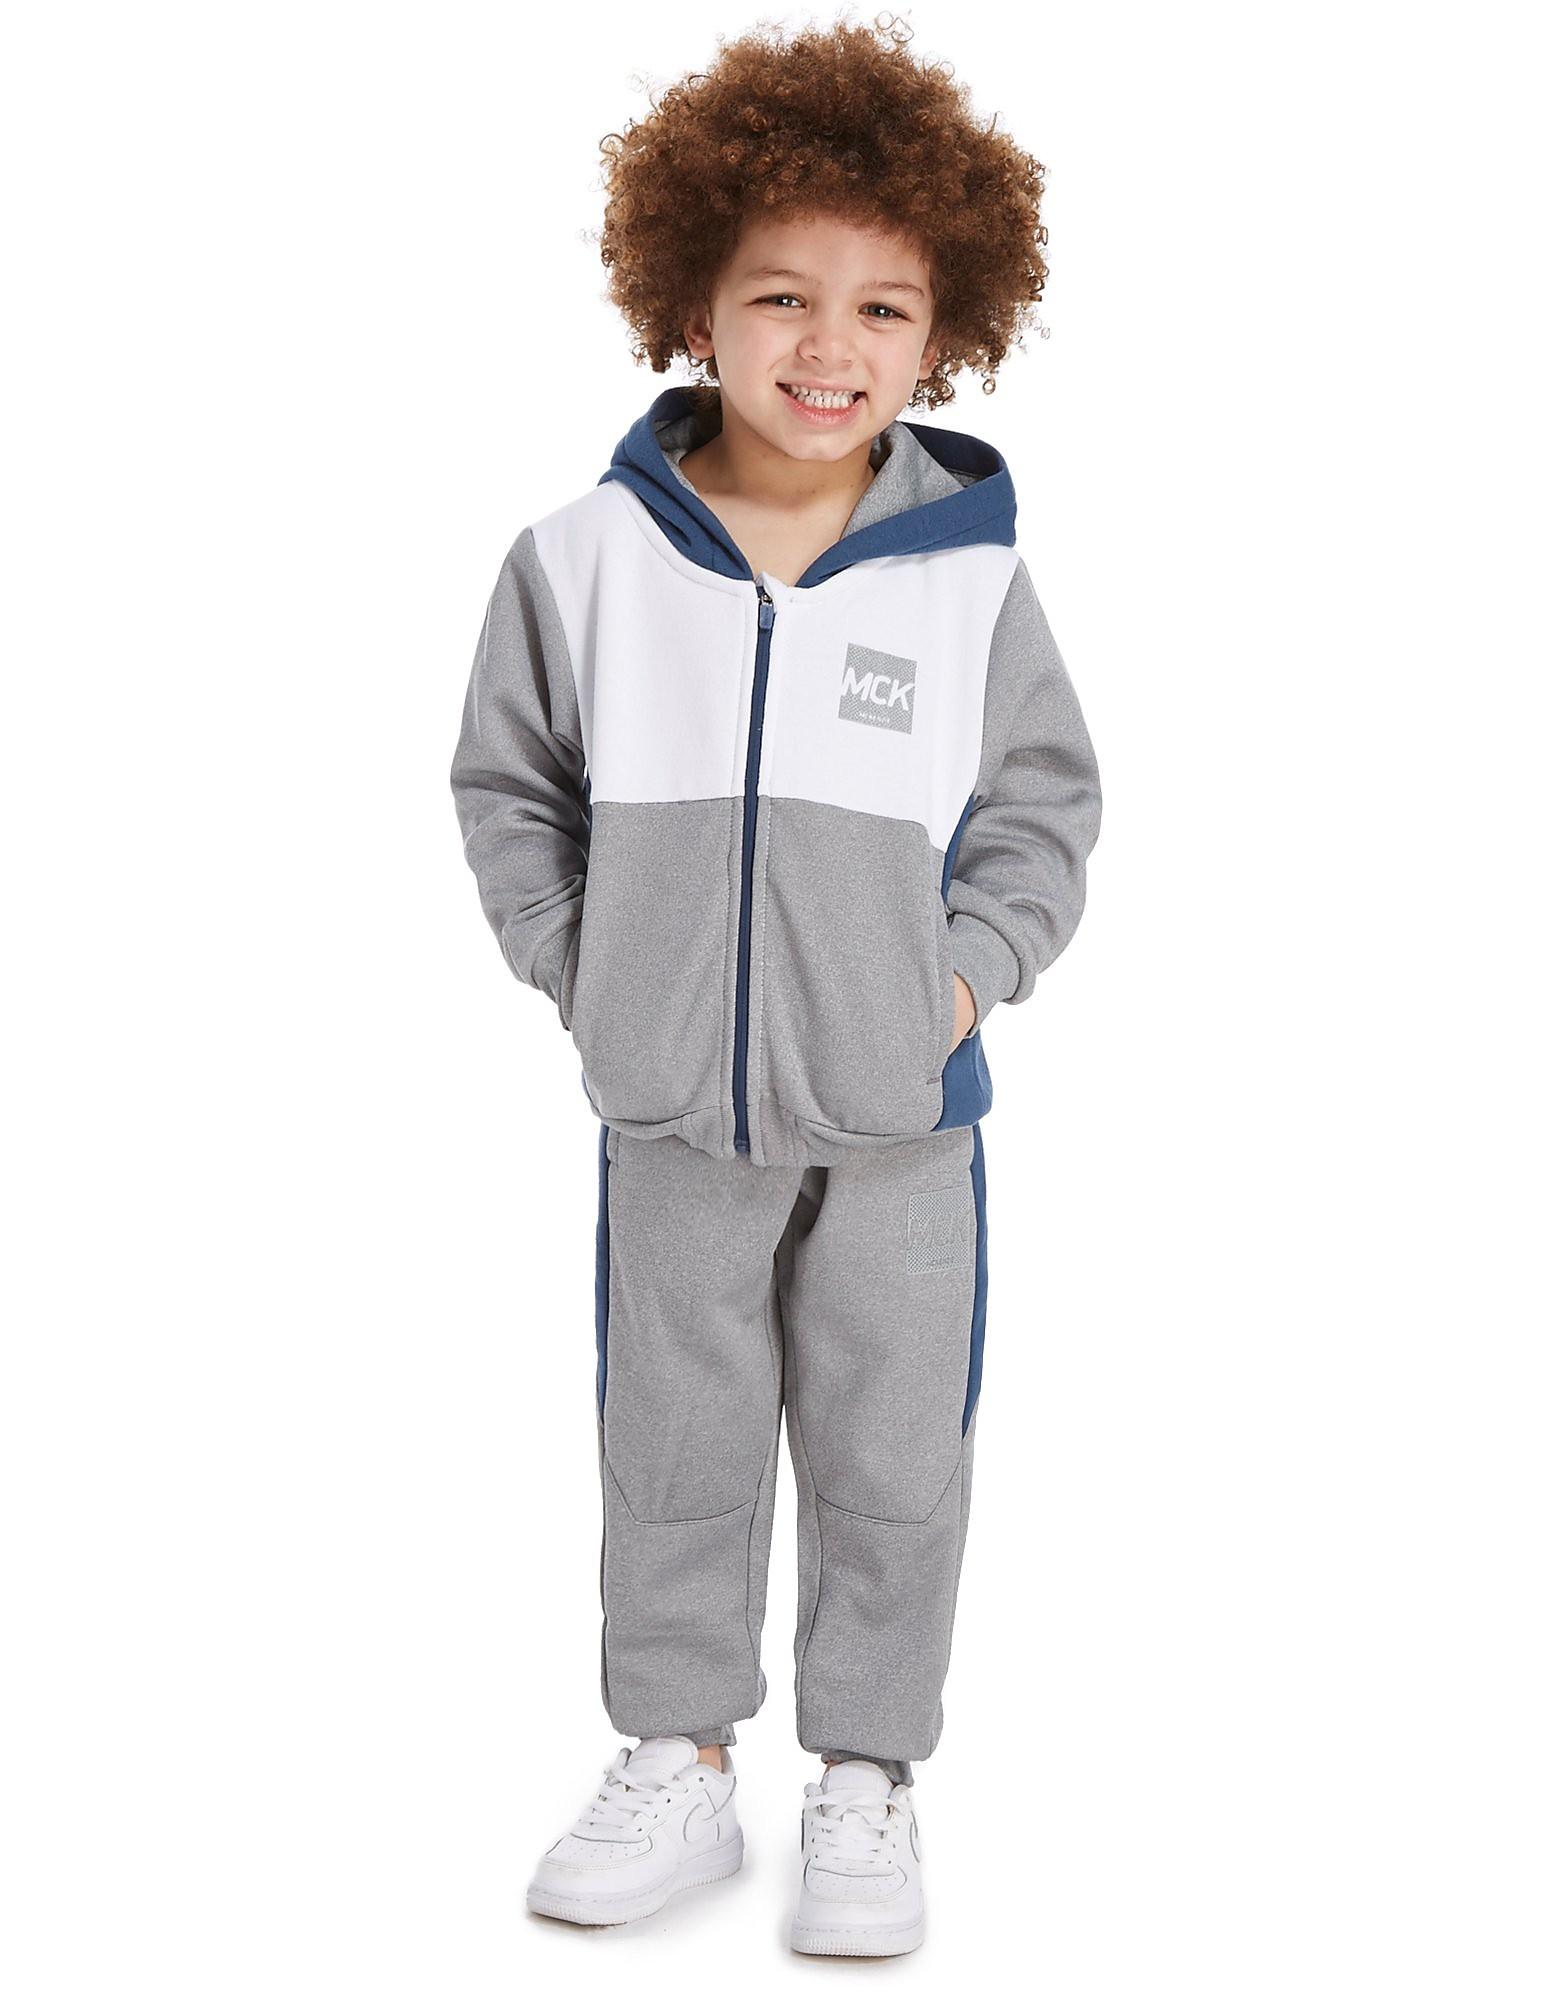 McKenzie Oberon Poly Suit Children